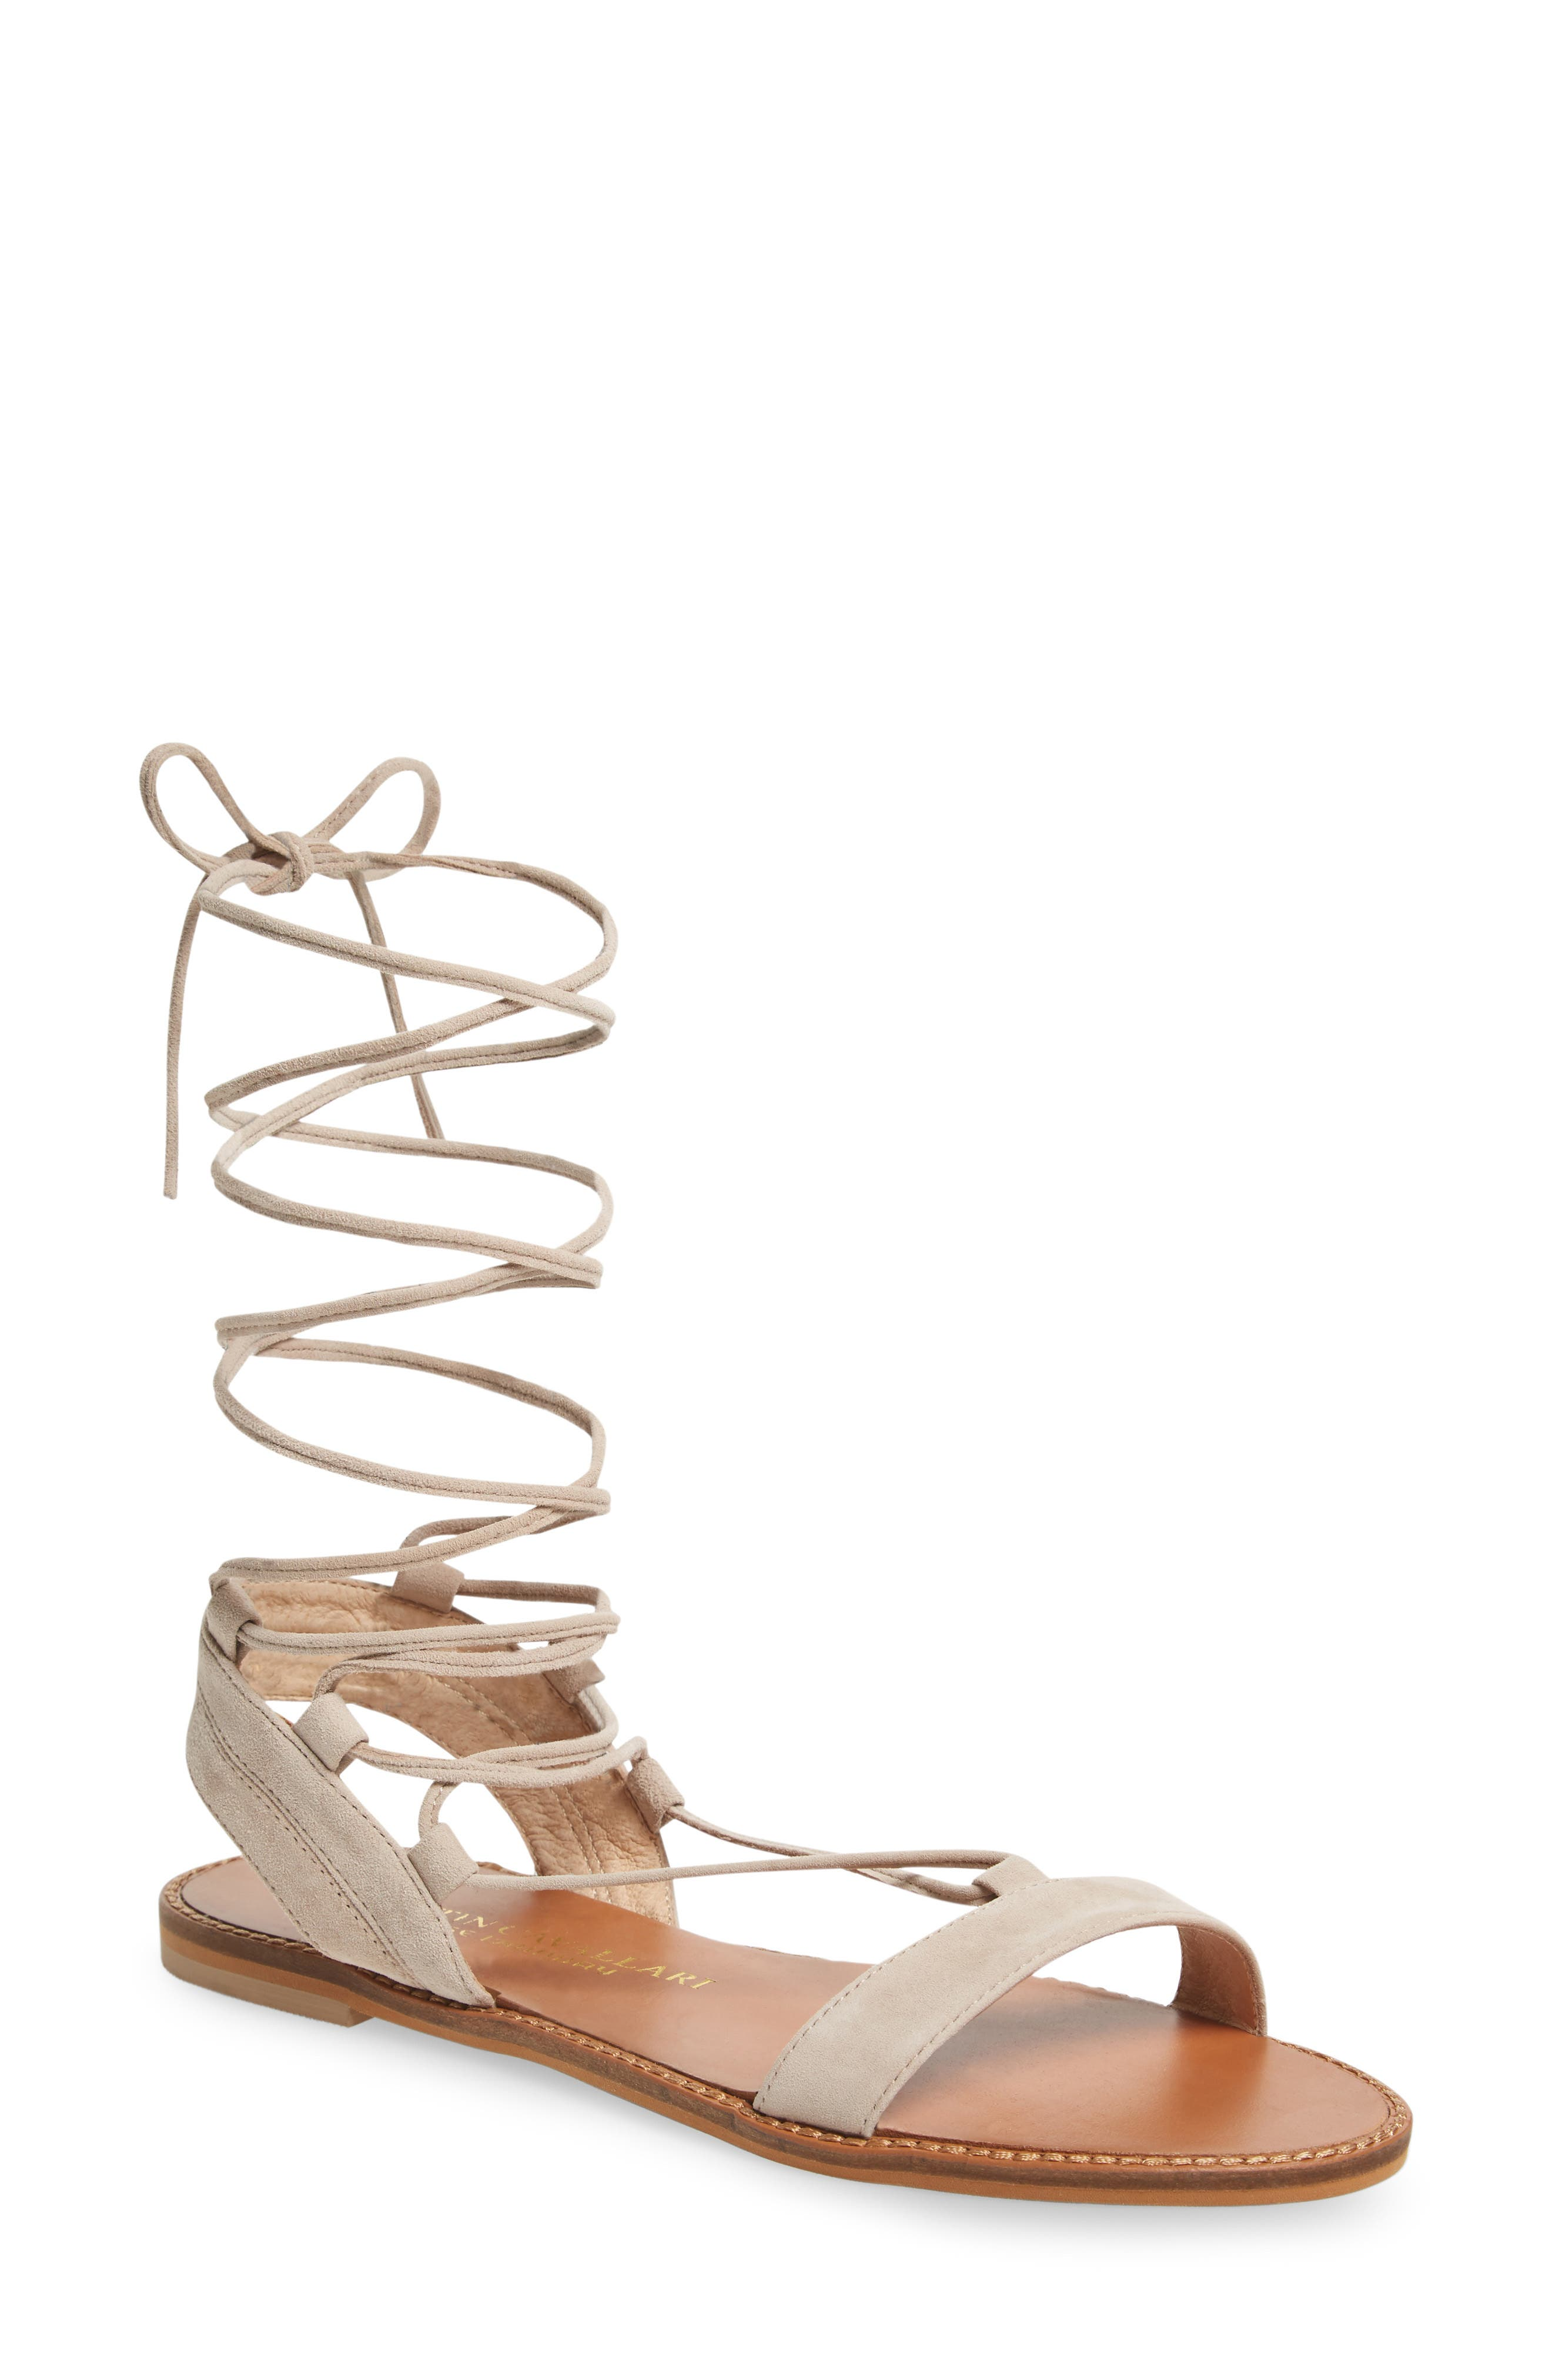 Kristin Cavallari Brea Ankle Wrap Sandal (Women)